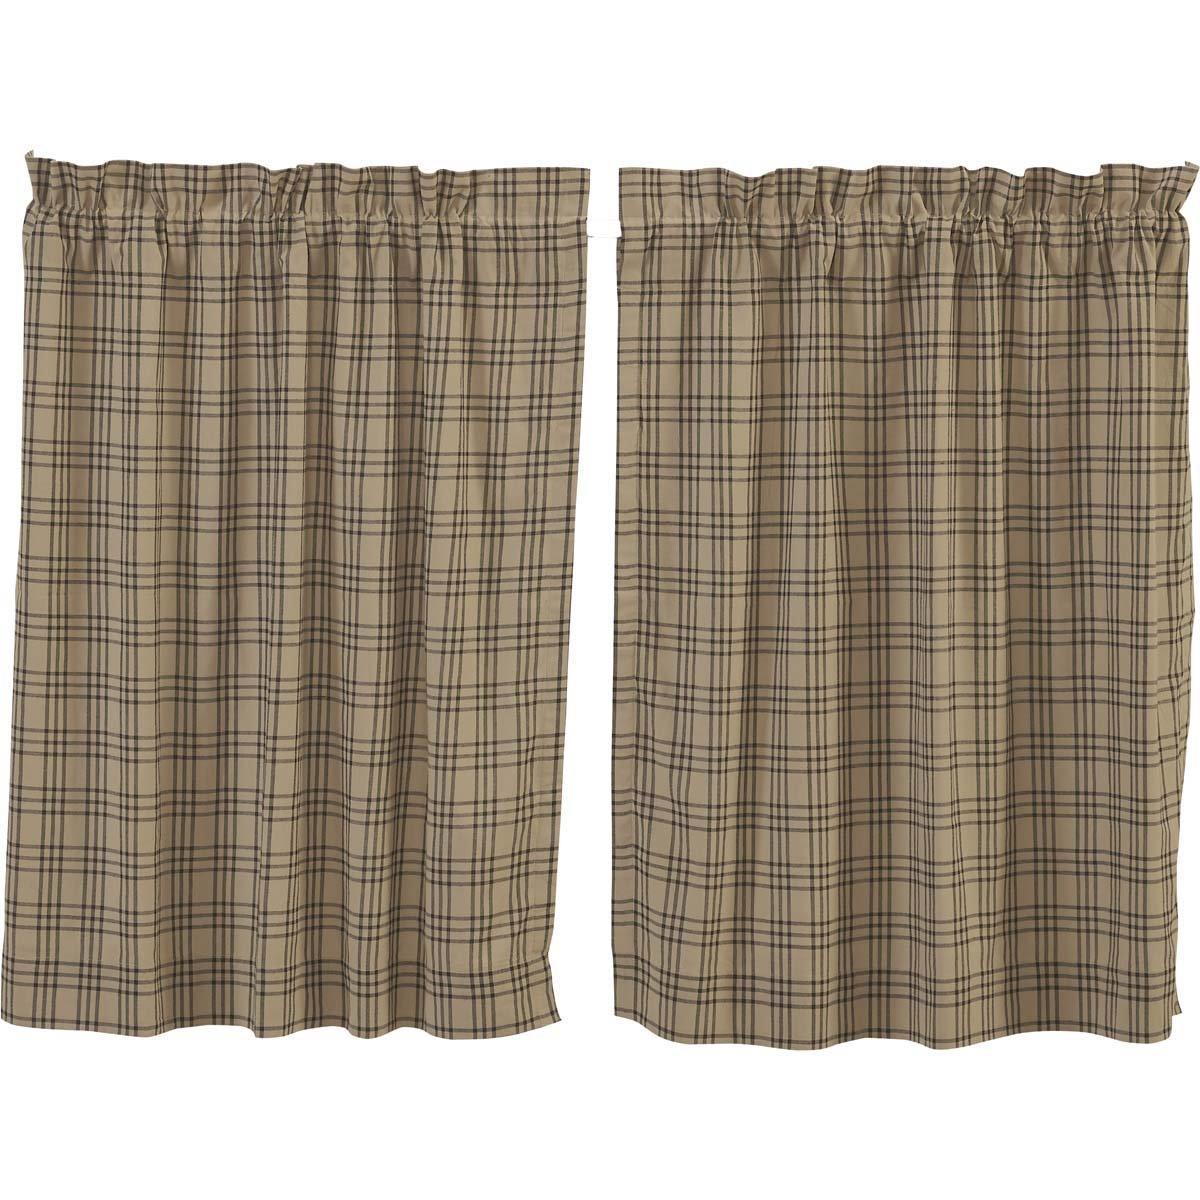 VHC Brands Farmhouse Kitchen Window Curtains - Sawyer Mill Tan Tier Pair 36x36 Charcoal Dark